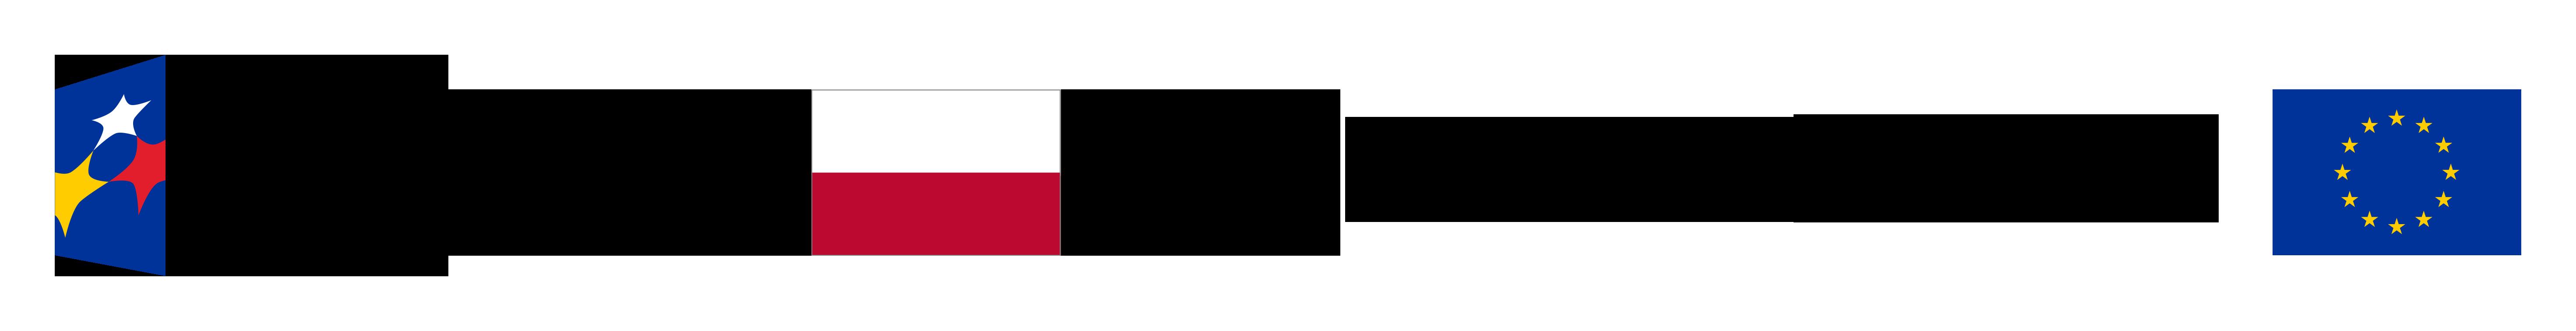 FE_POWER_poziom_pl-1_rgb